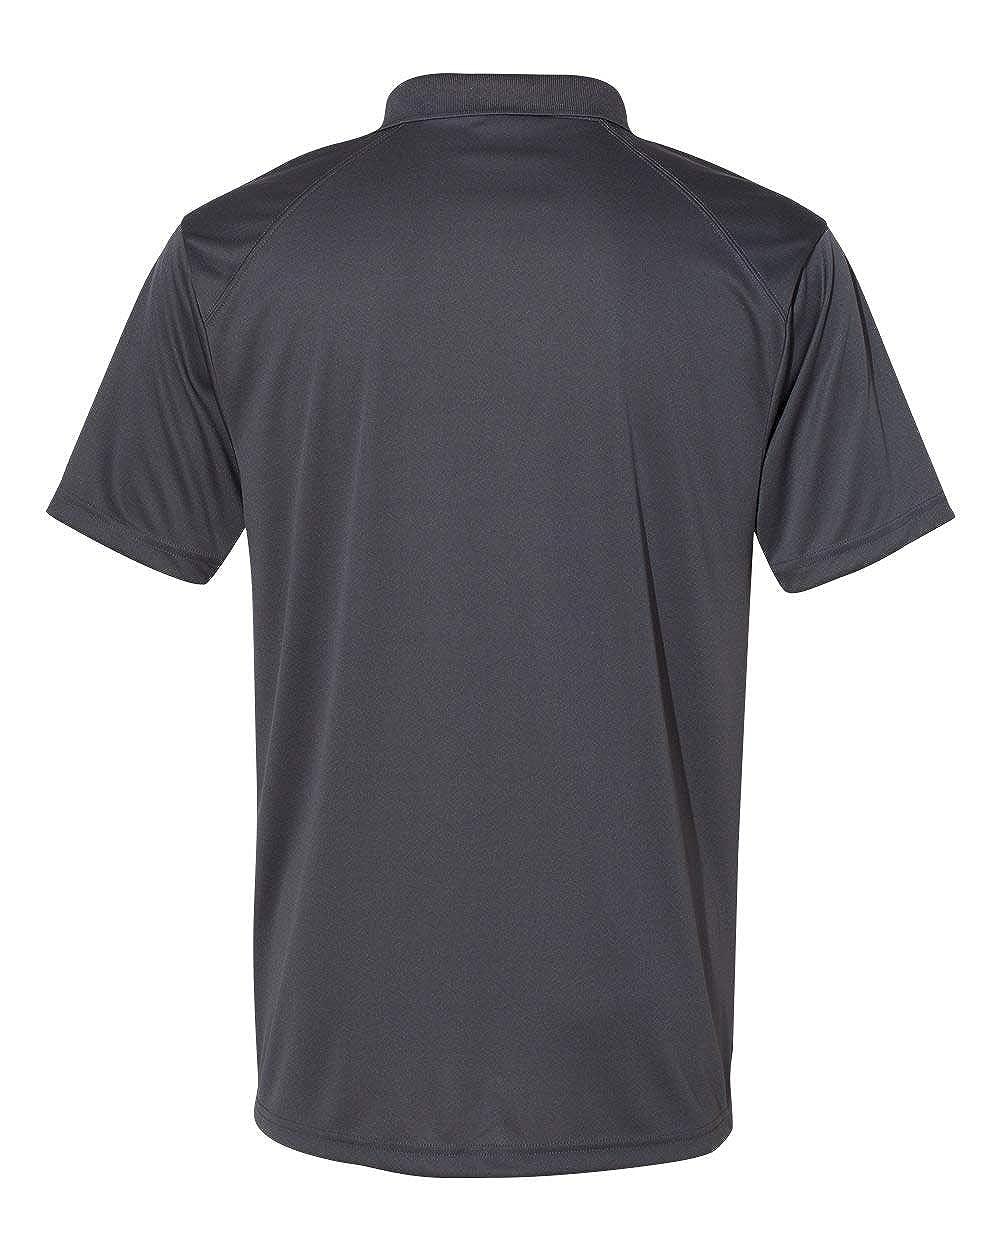 C2 Sport Performance Raglan Sport Shirt 5900-4XL Graphite